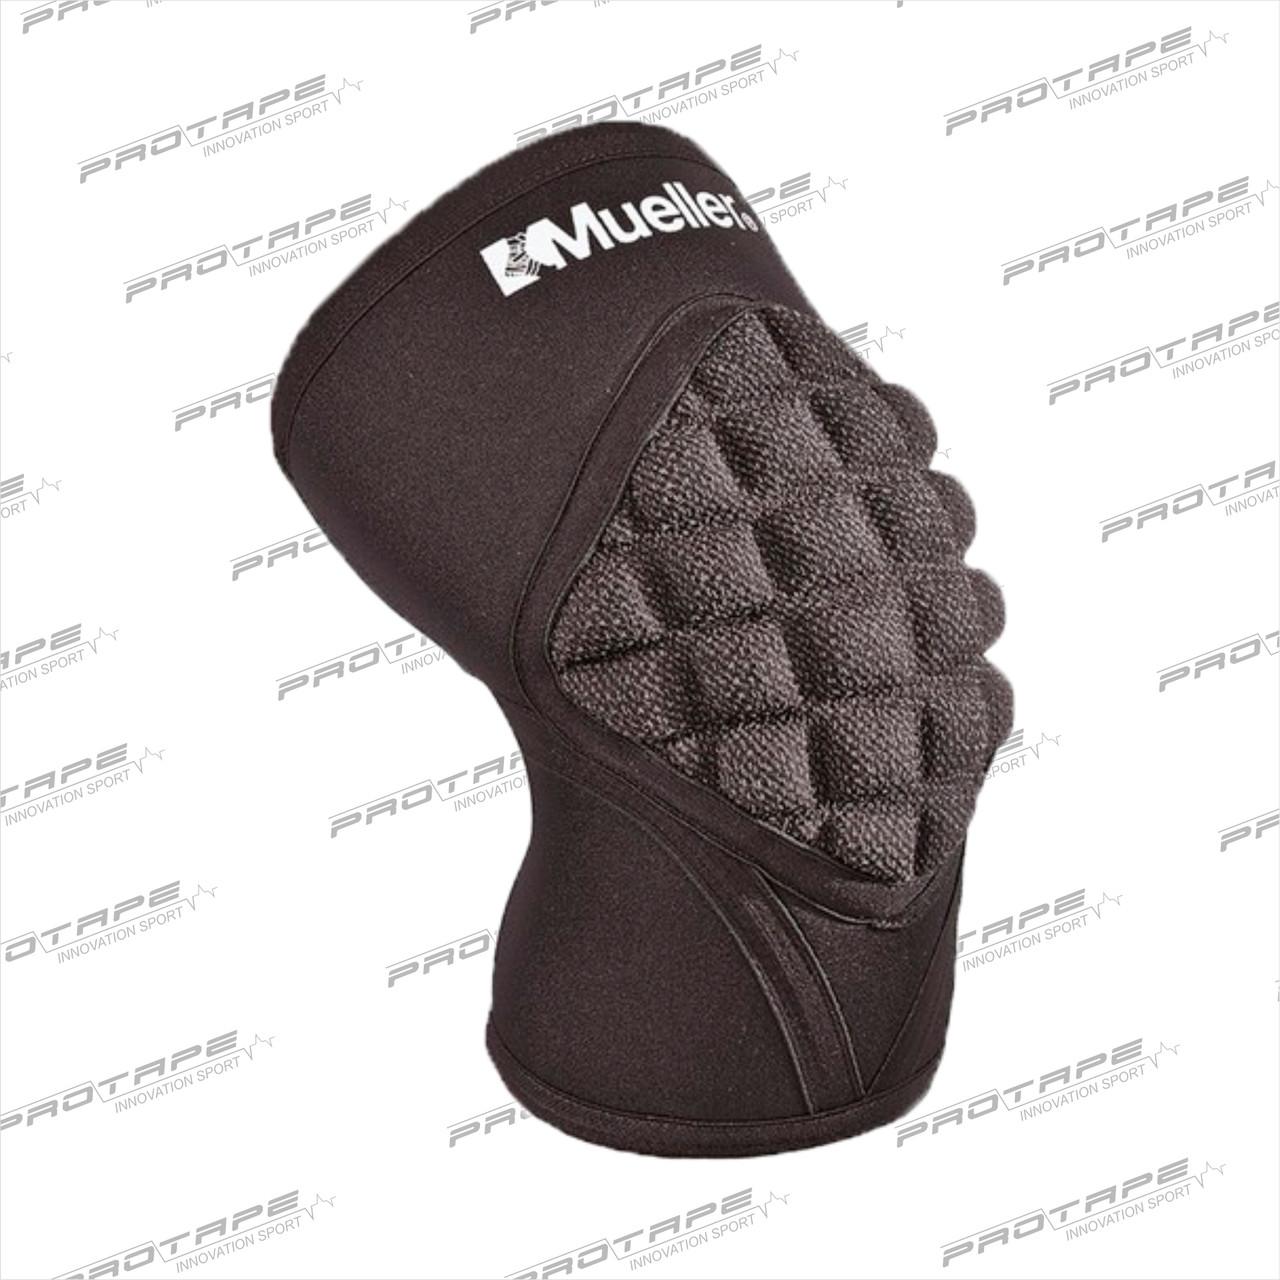 Бандаж на колено с Кевларом 54530/1 Mueller  Pro Level Knee Pad w/Kevlar